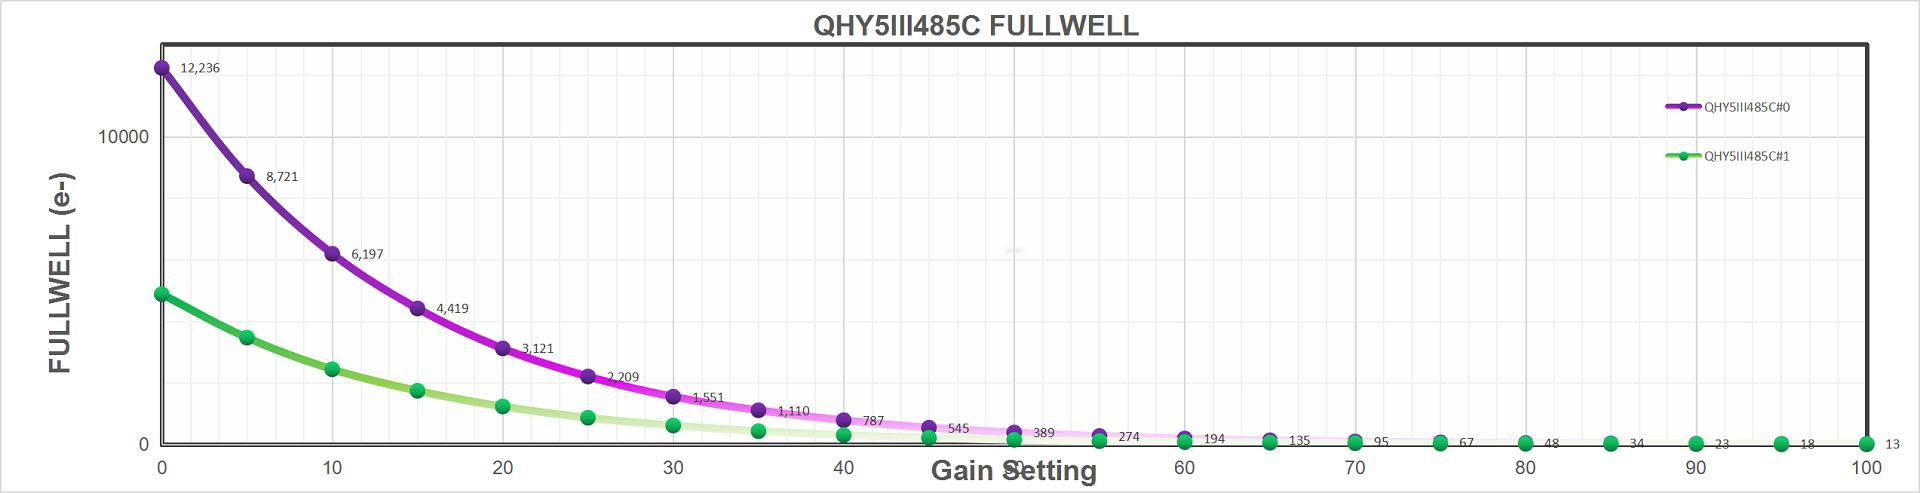 QHY 5-III-485C Fullwell